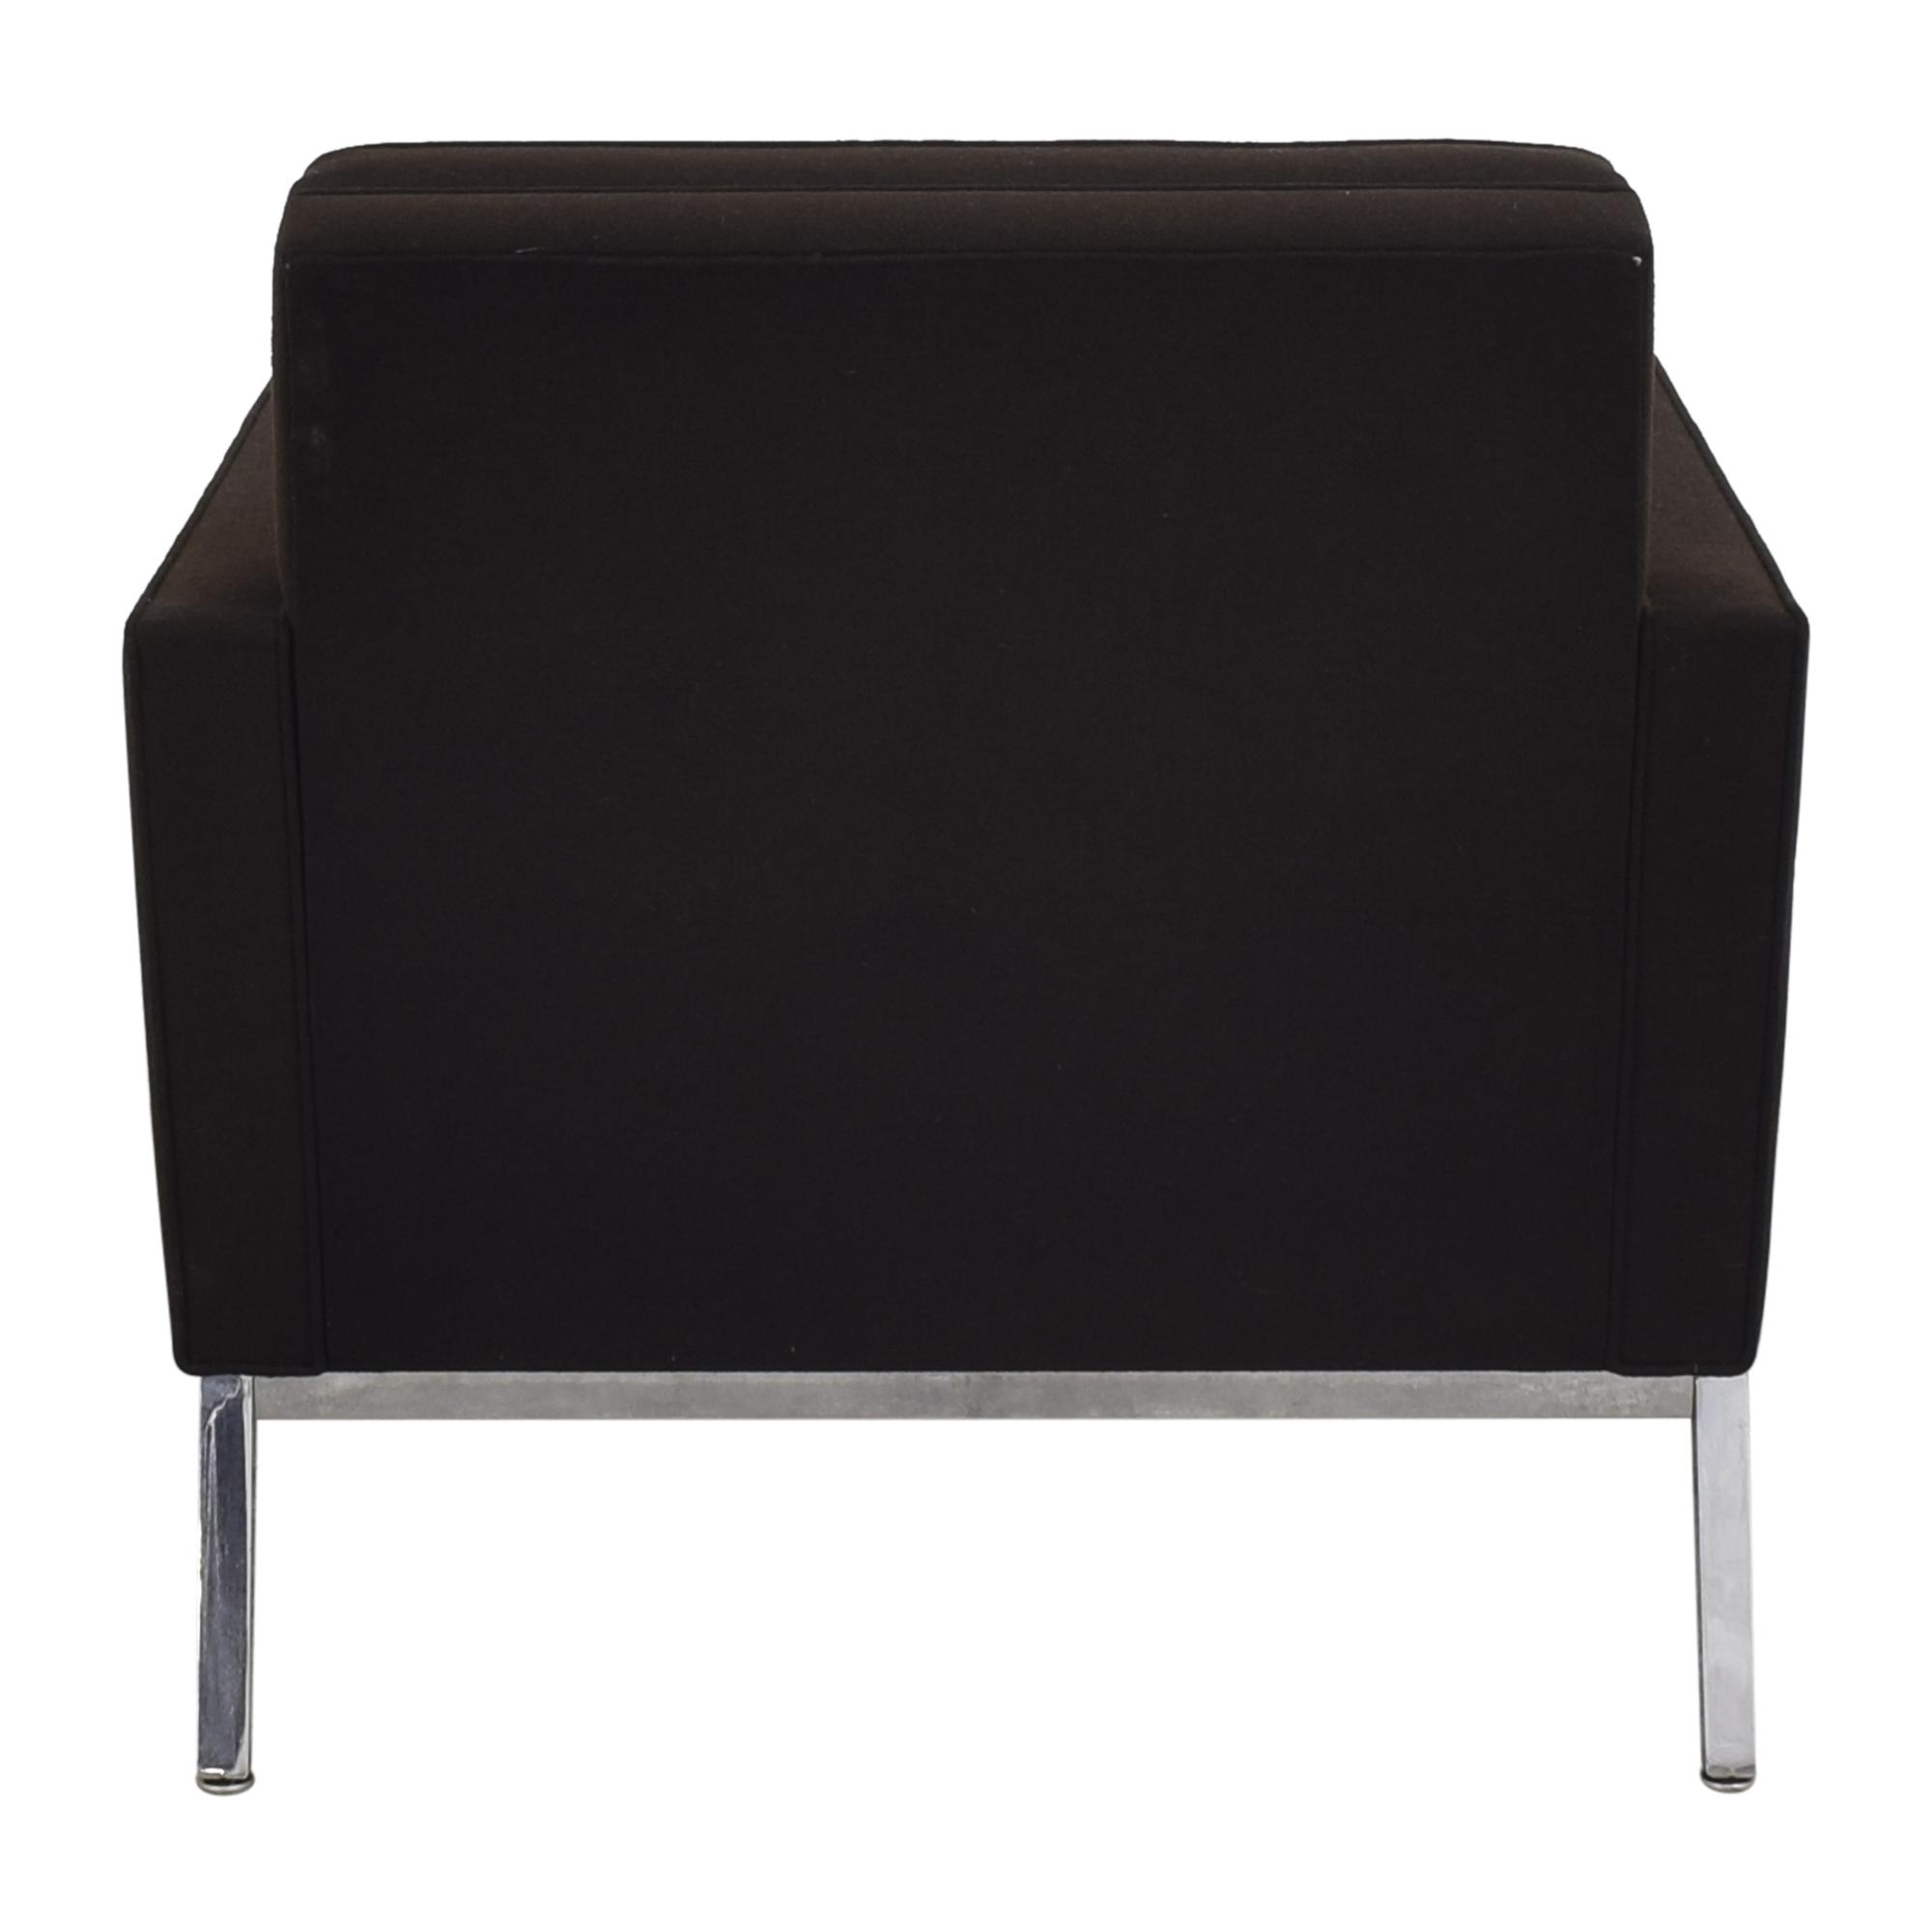 Steelcase Steelcase Vintage Club Chair dimensions